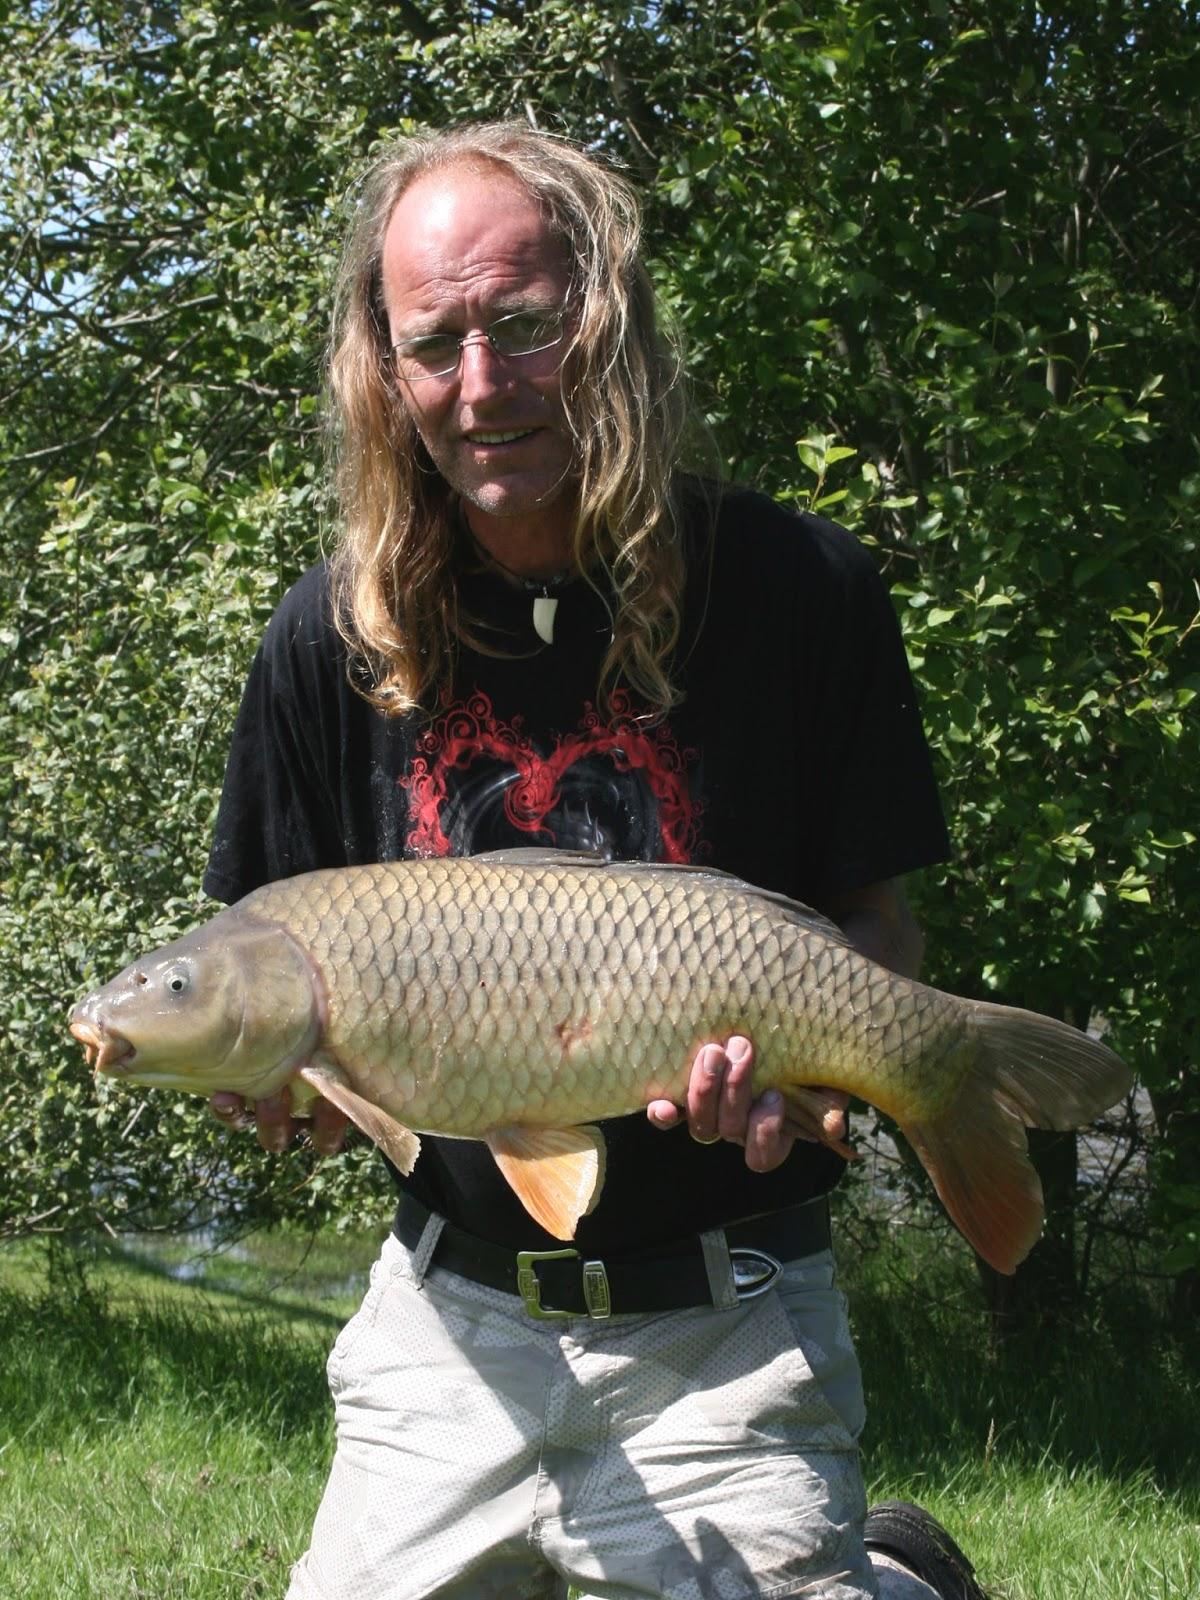 Common Carp Keyring Anglers Keyring,Gift For Any Angler. Silver Carp Fishing